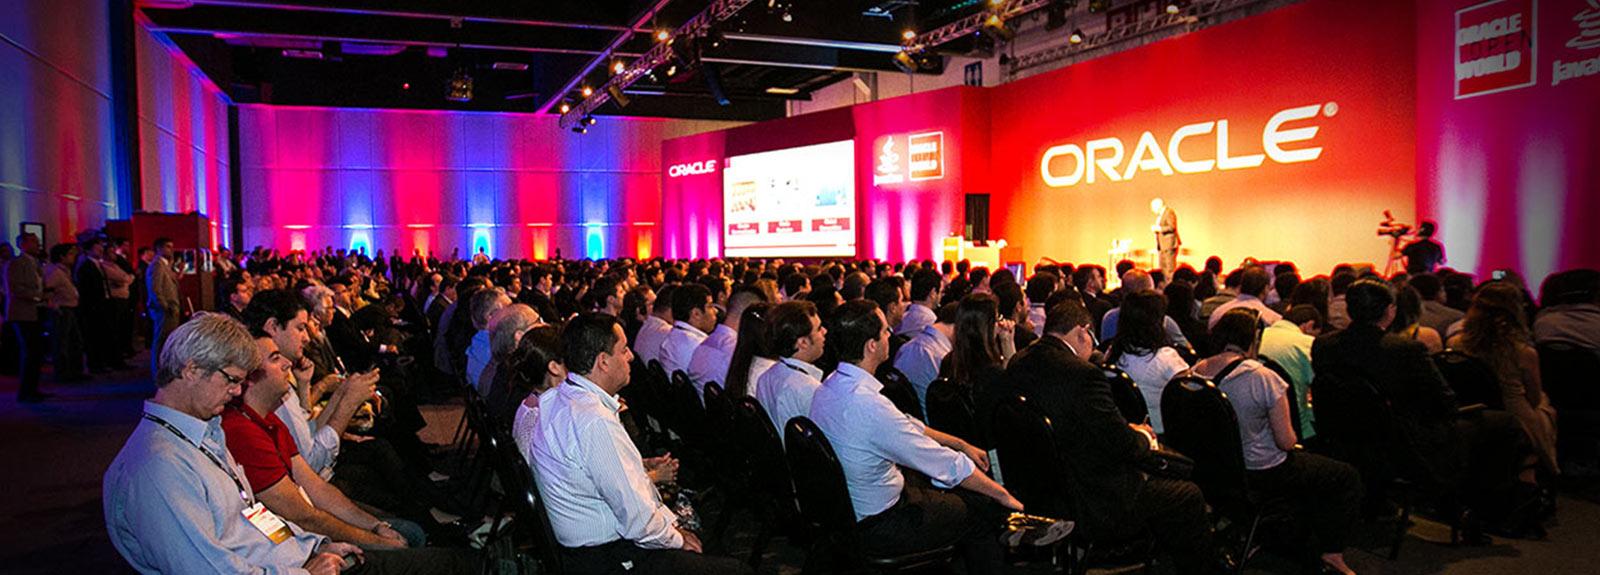 Oracle OpenWorld 2018 i trend per le applicazioni in cloud